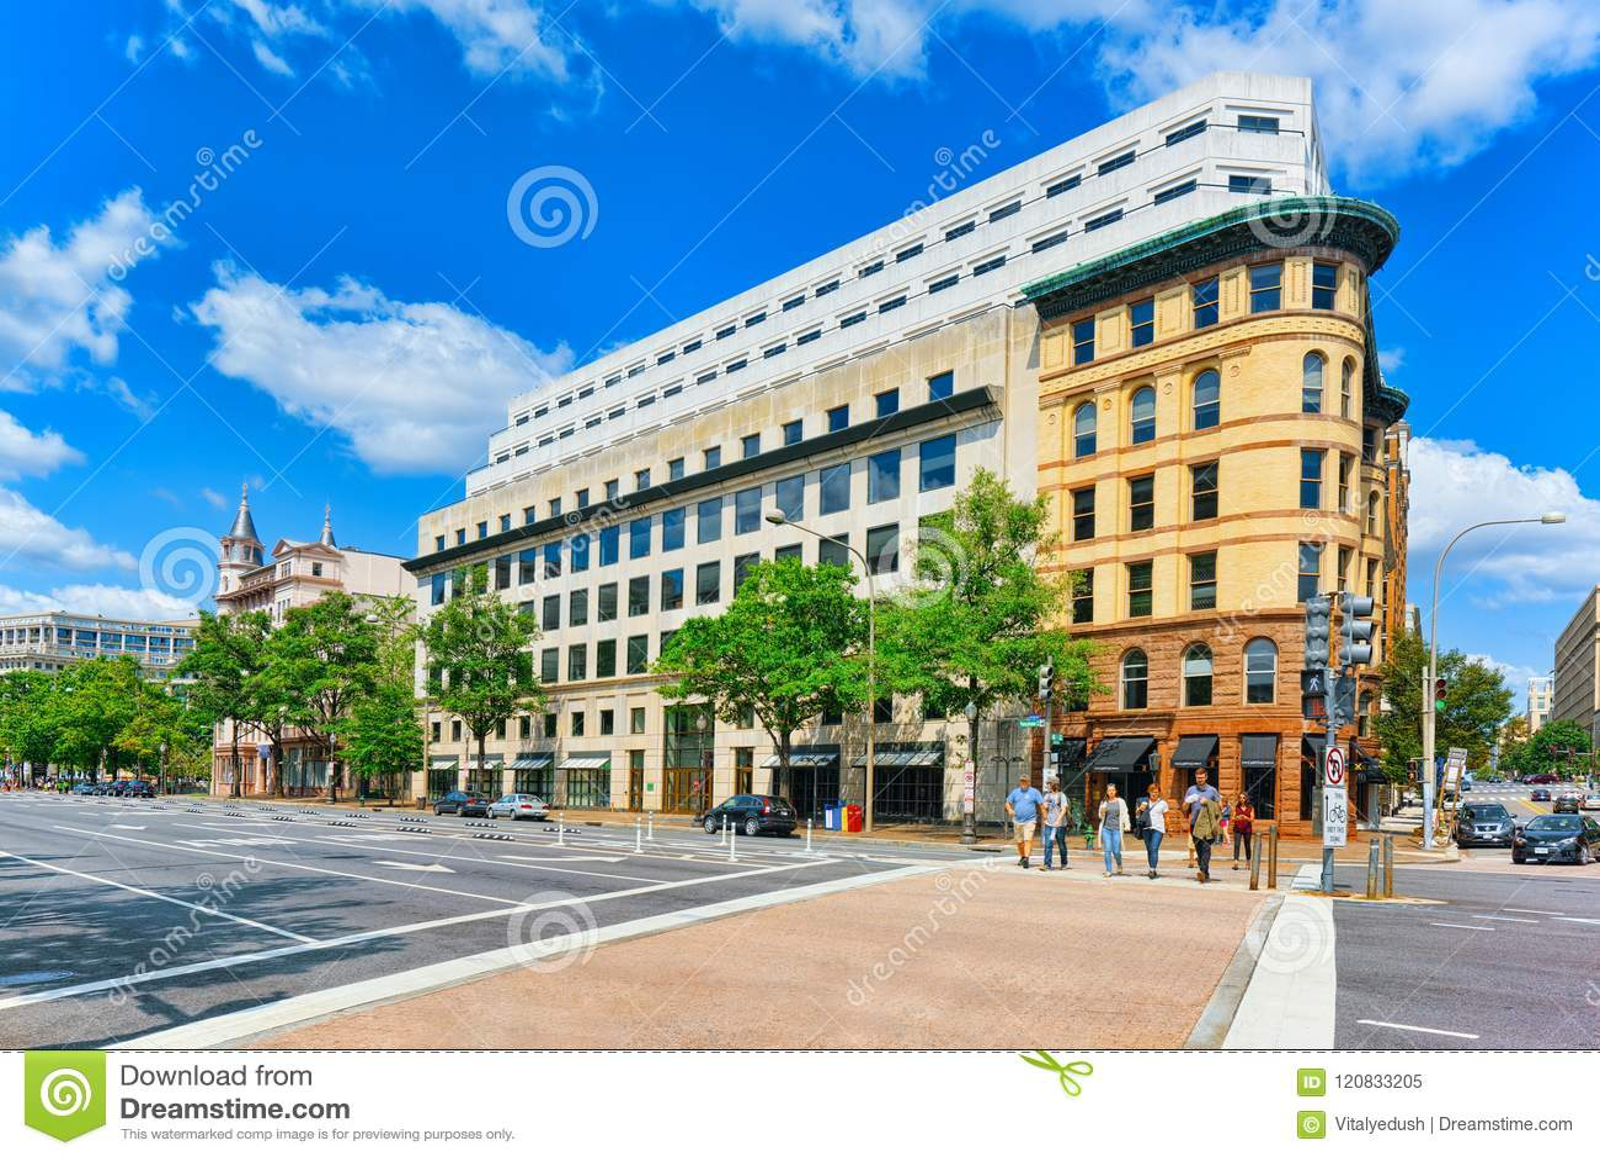 Nw Credit Union >> Washington Usa 601 Pennsylvania Ave Nw Credit Union